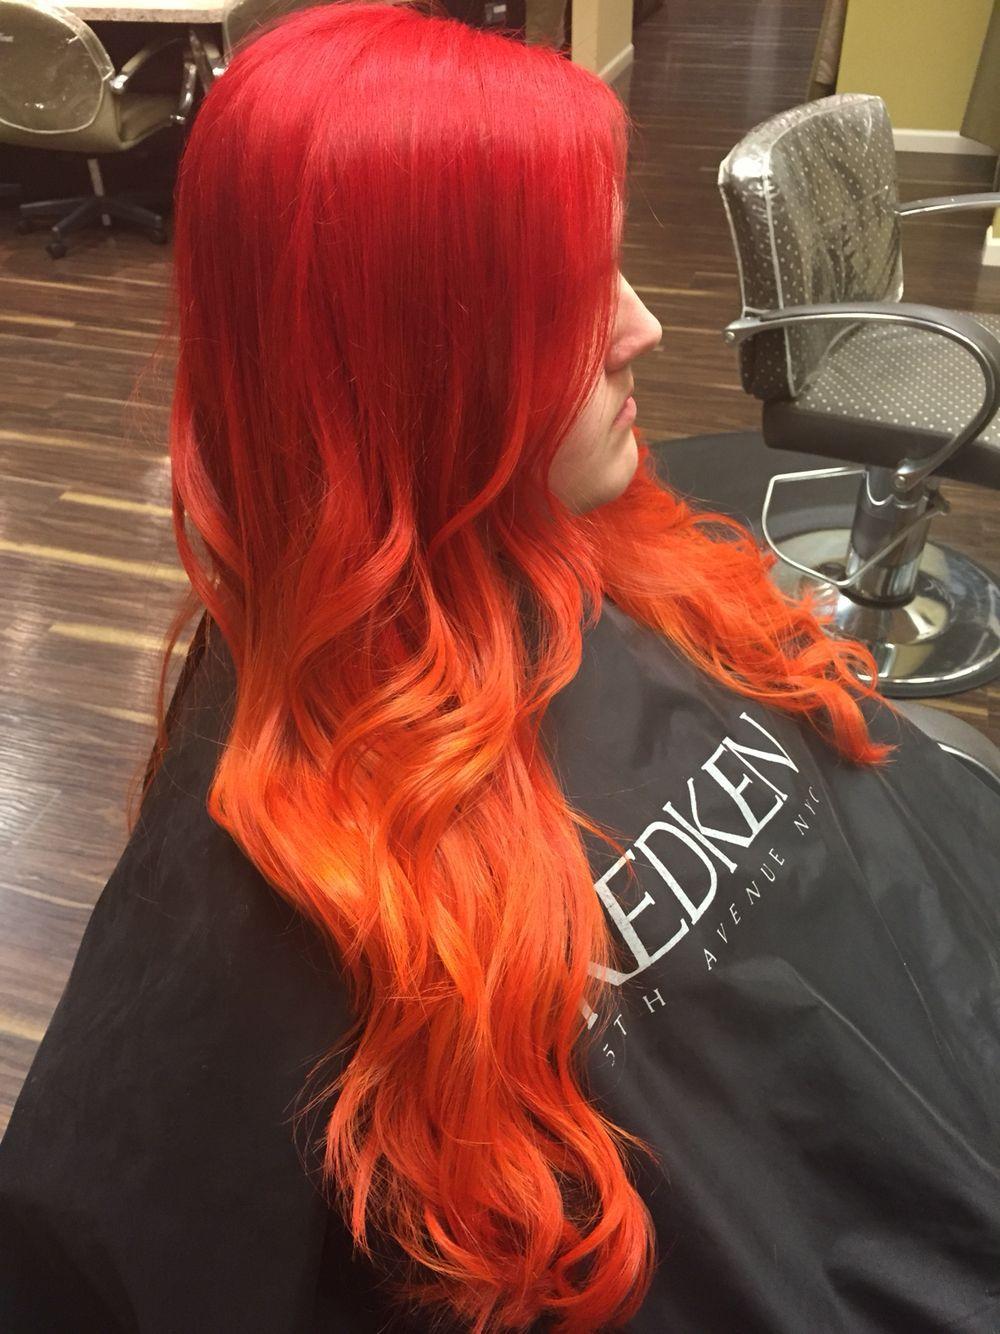 Hair red to orange fire creative balayageombre ellemarieanna